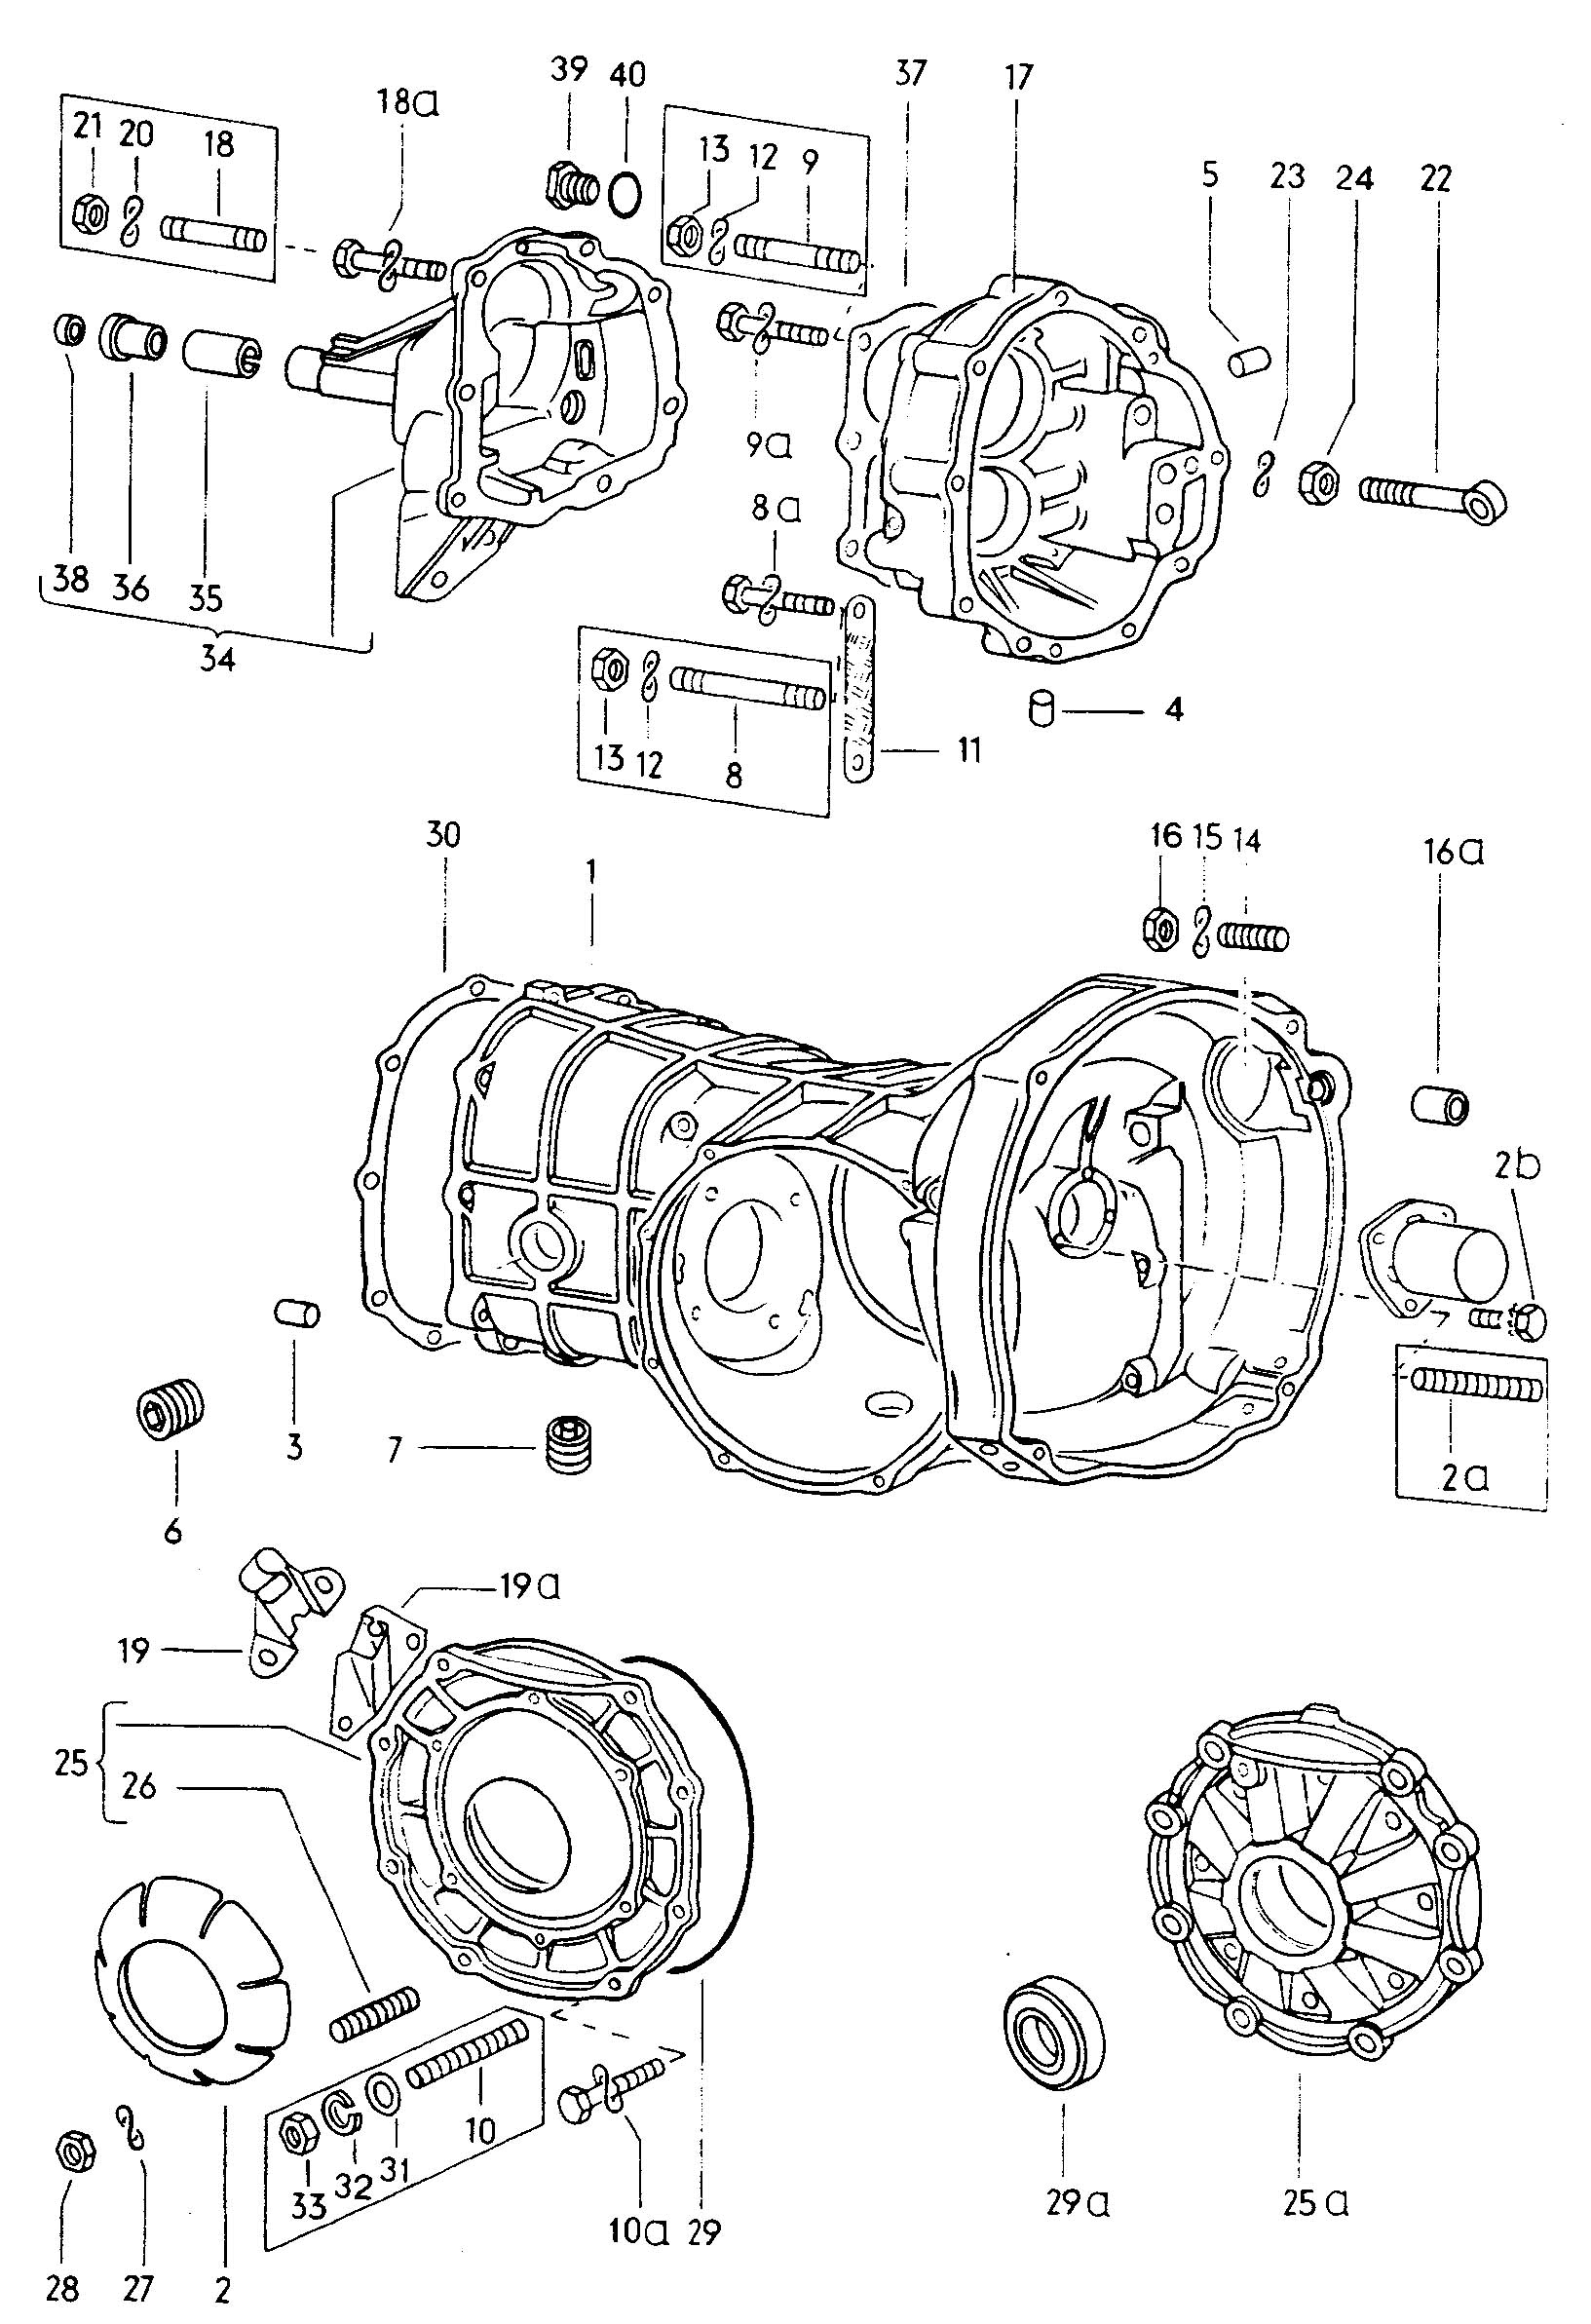 1965 pontiac tach wiring diagram